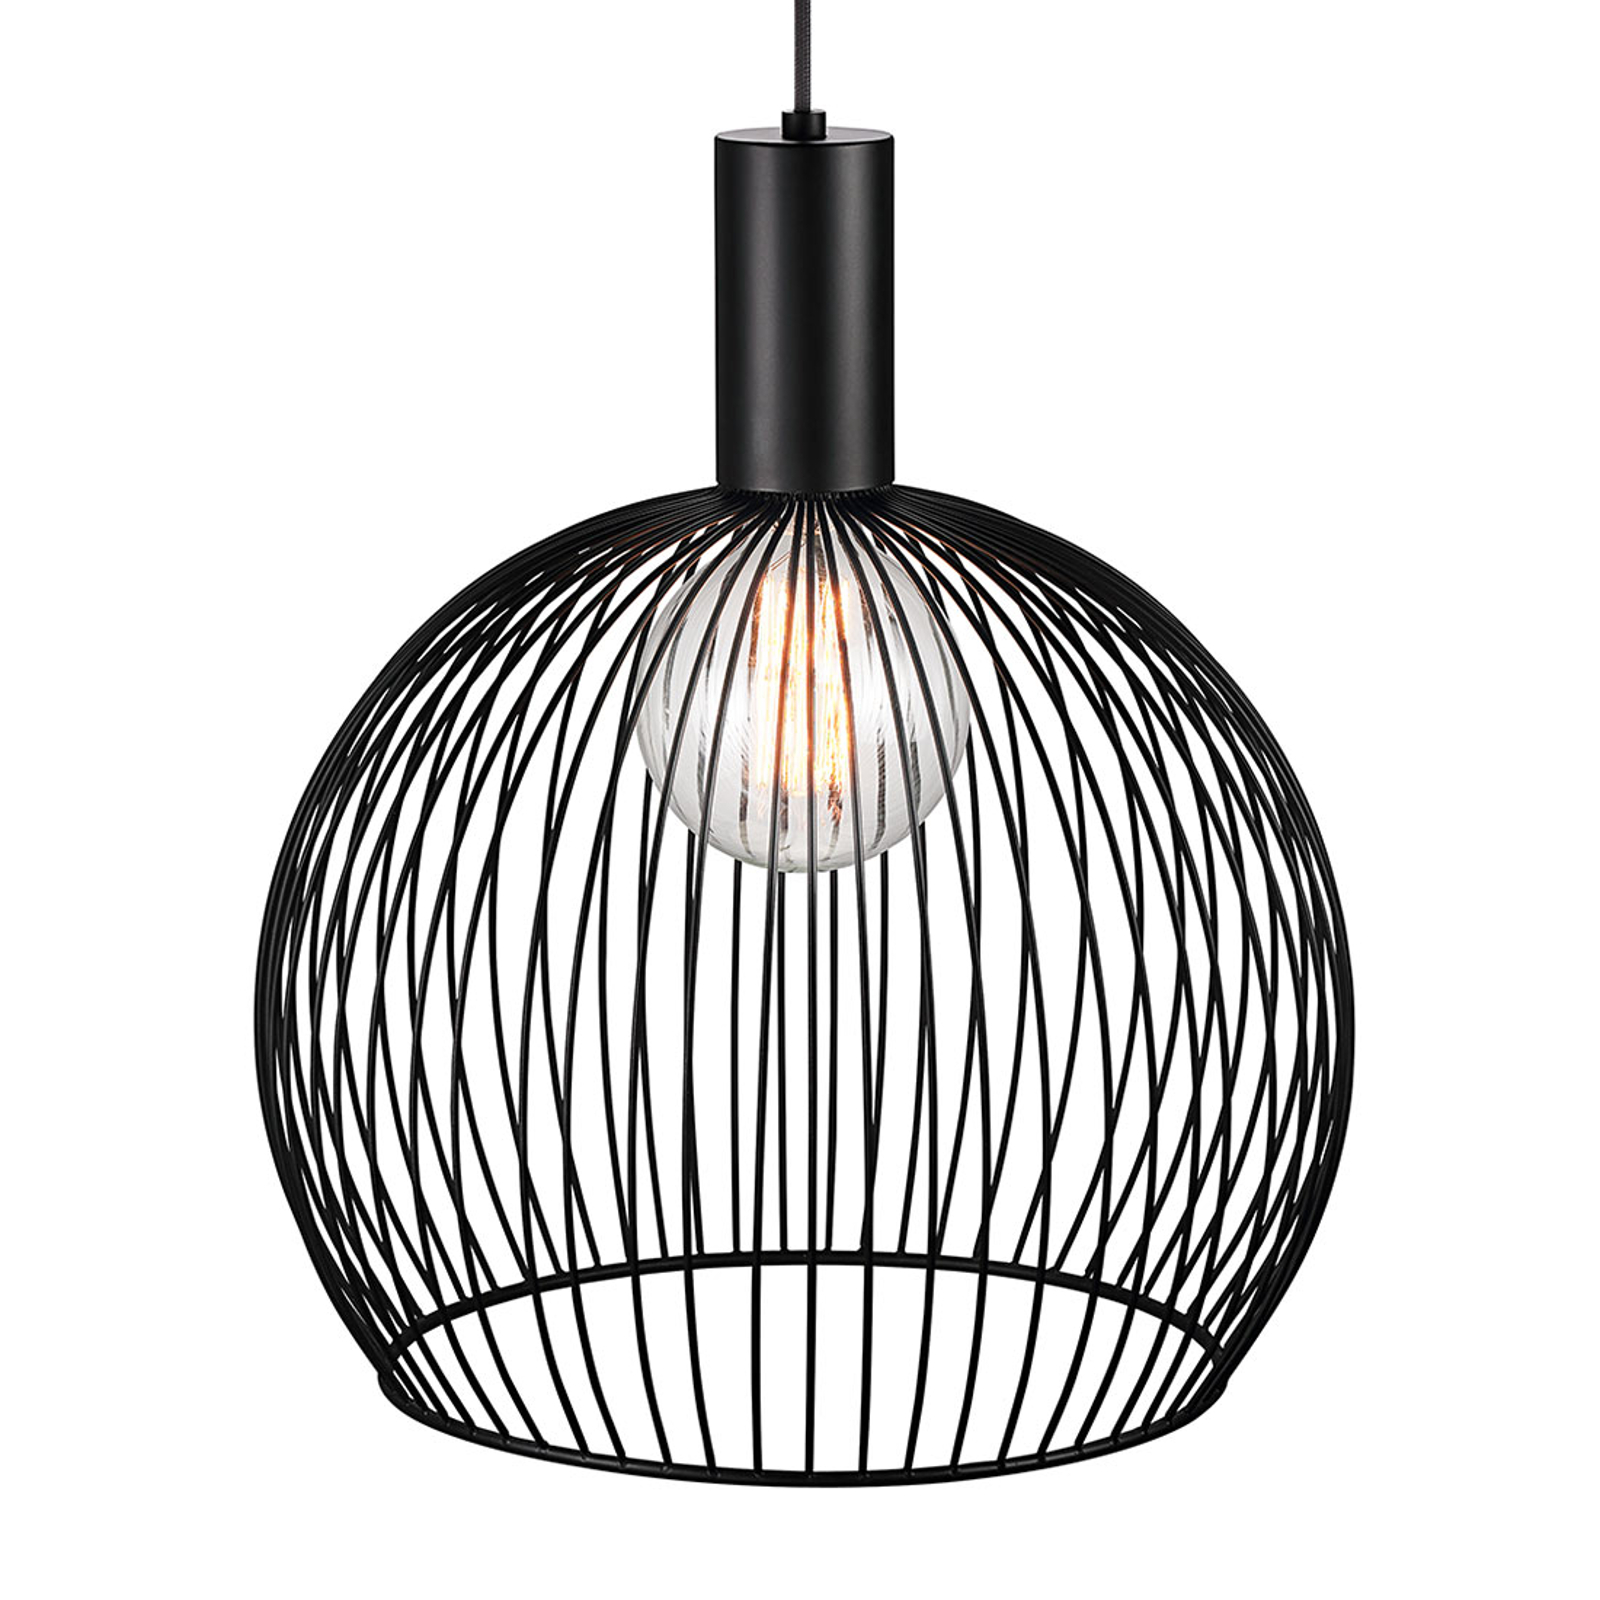 Lampa wisząca Aver, 40 cm